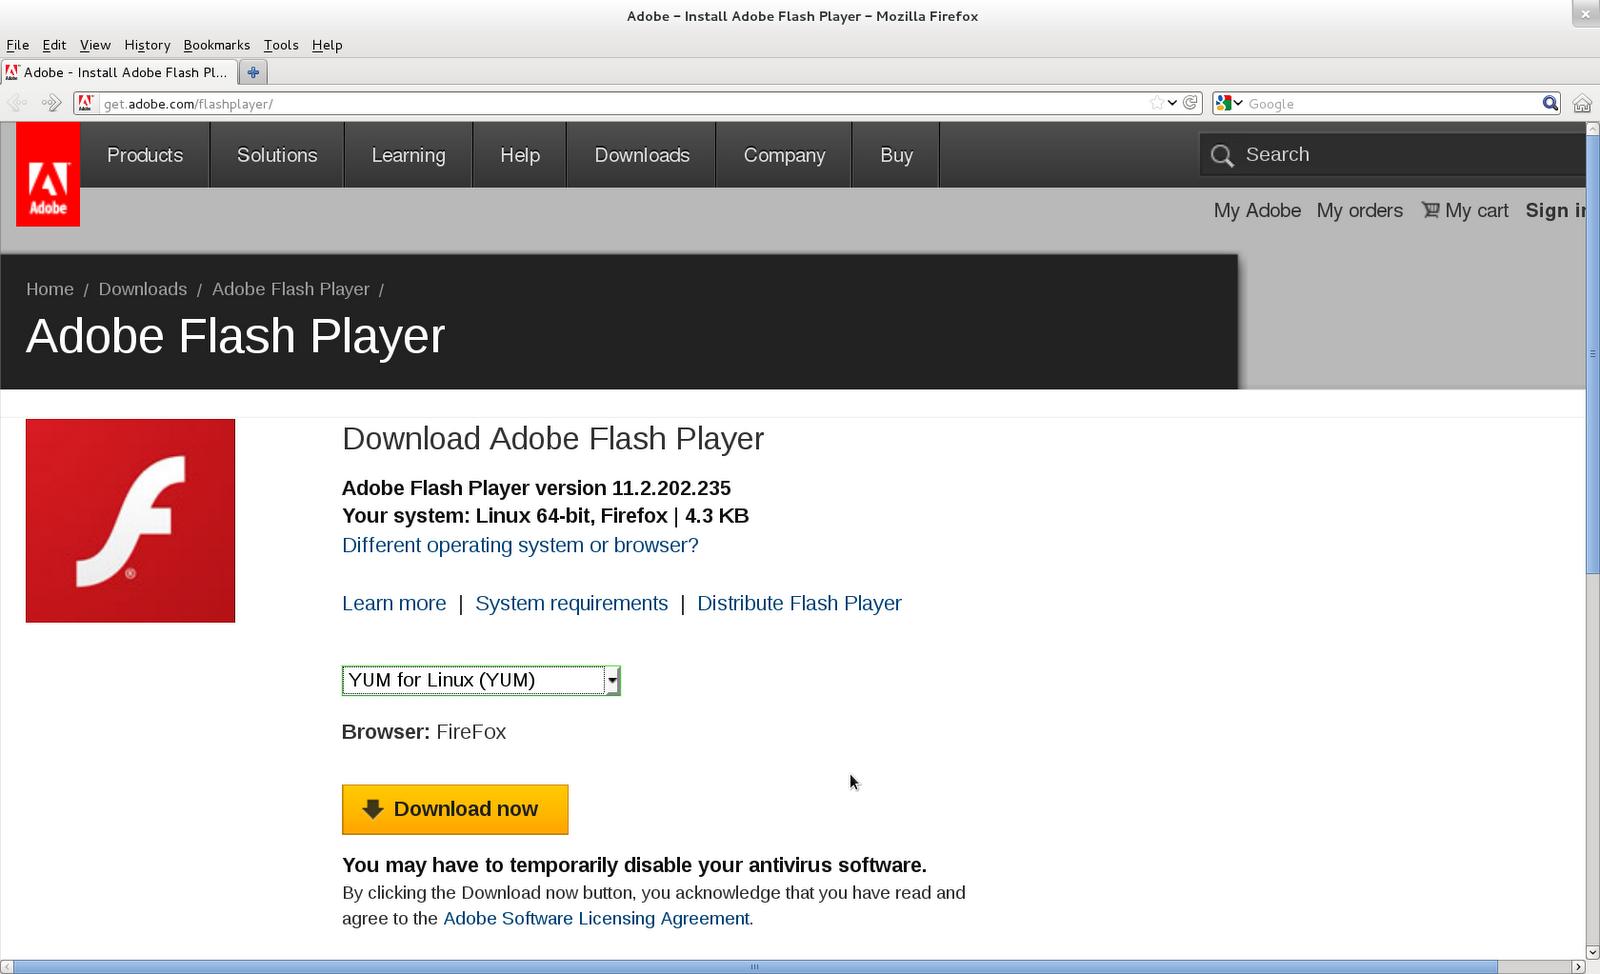 TechnoZeal: Install Adobe Flash Player on Fedora 16 / Fedora 17